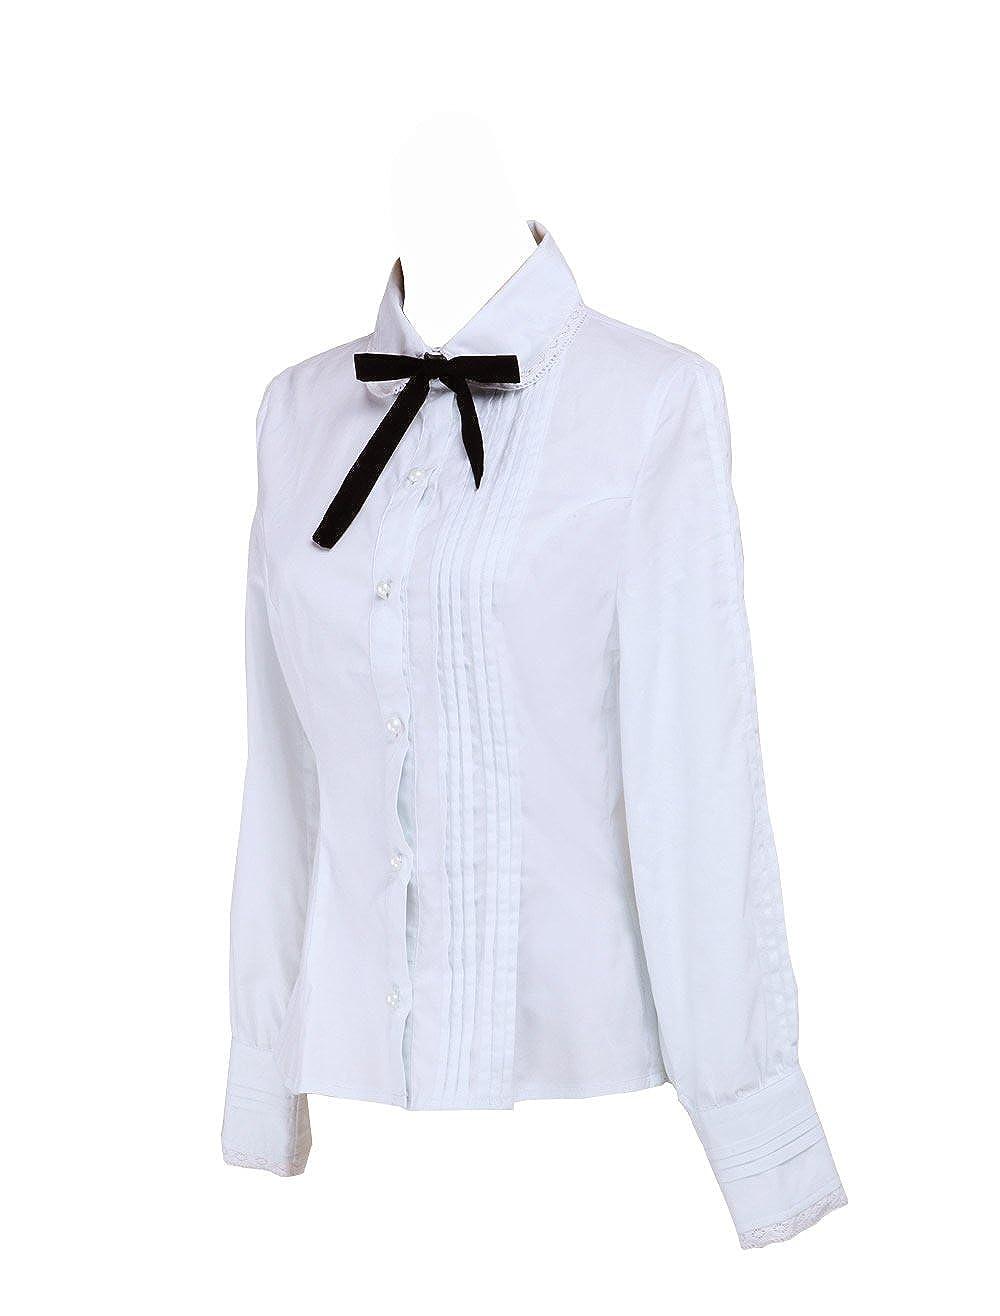 00fd788c634133 Amazon.com  Antaina White Cotton Lace Black Bow Tie Simple Victorian Lolita  Shirt Blouse  Clothing